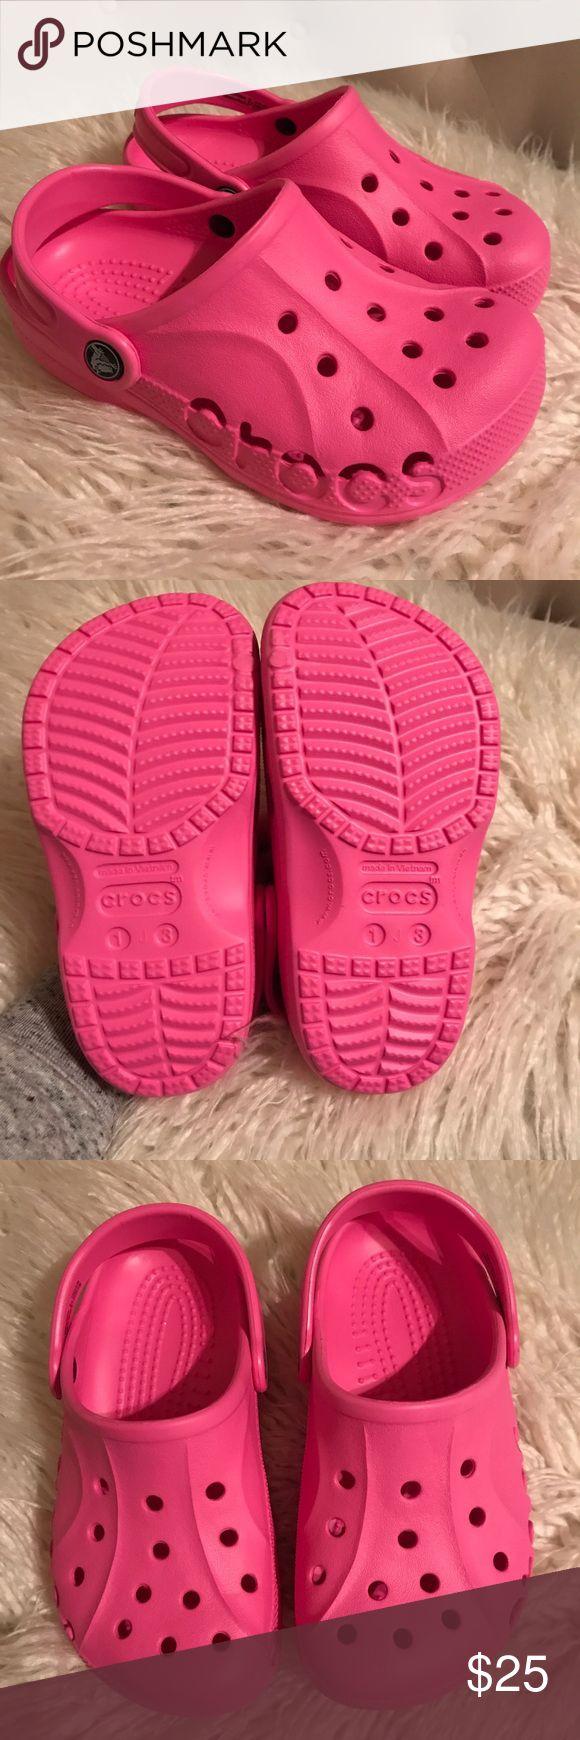 Hot Pink Crocs NWOT pink crocs for girls CROCS Shoes Sandals & Flip Flops